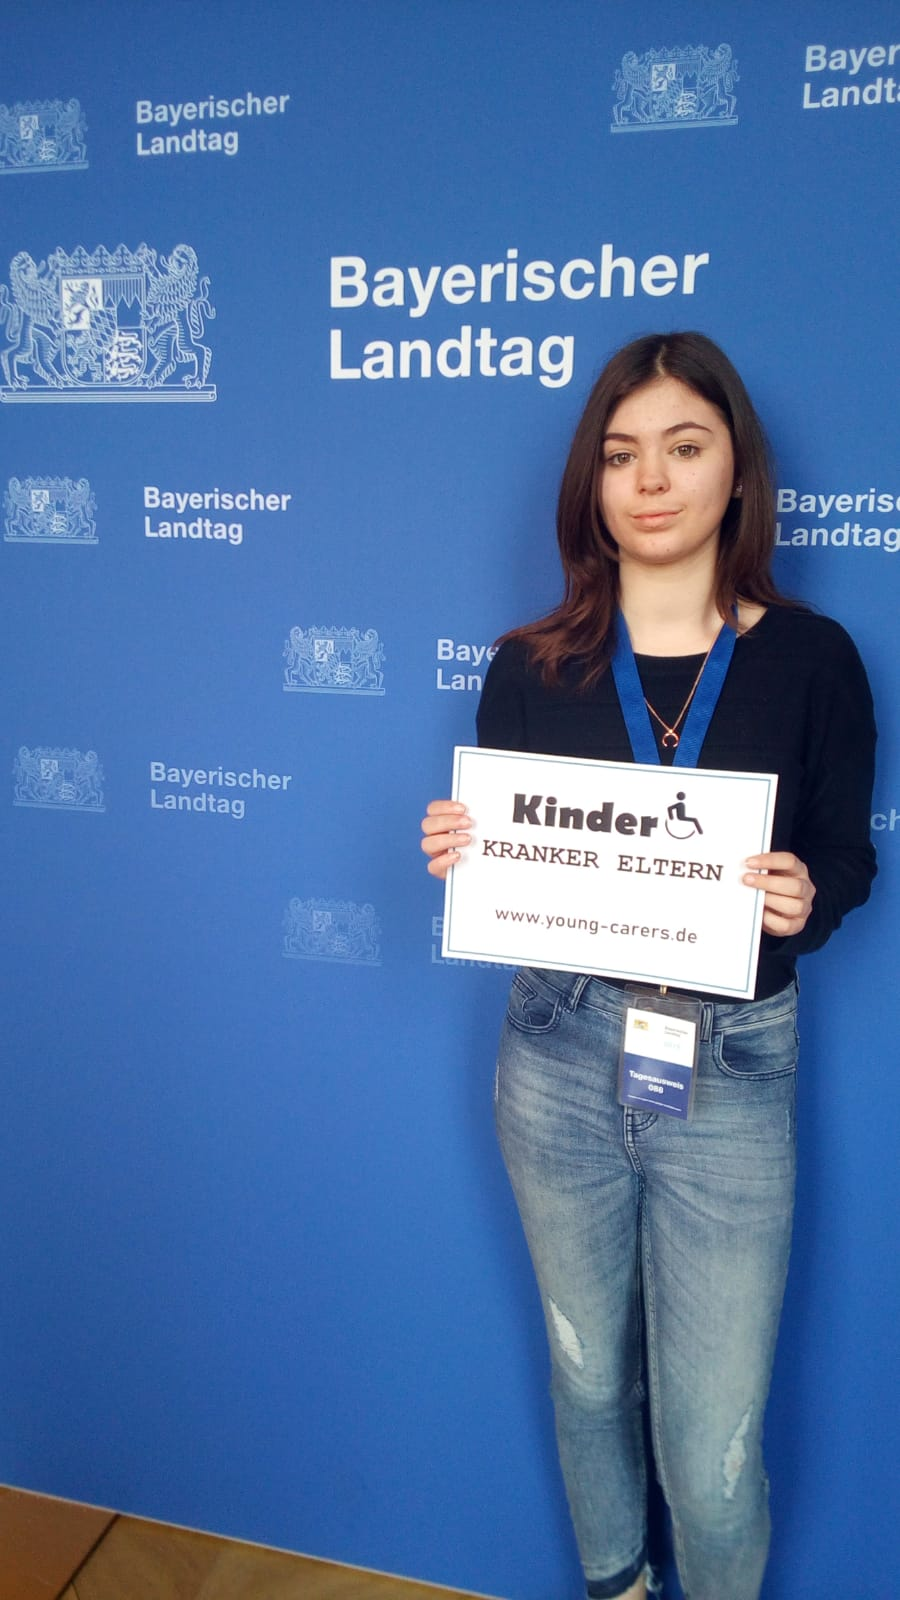 Young-Carer in Bayerischen Landtag